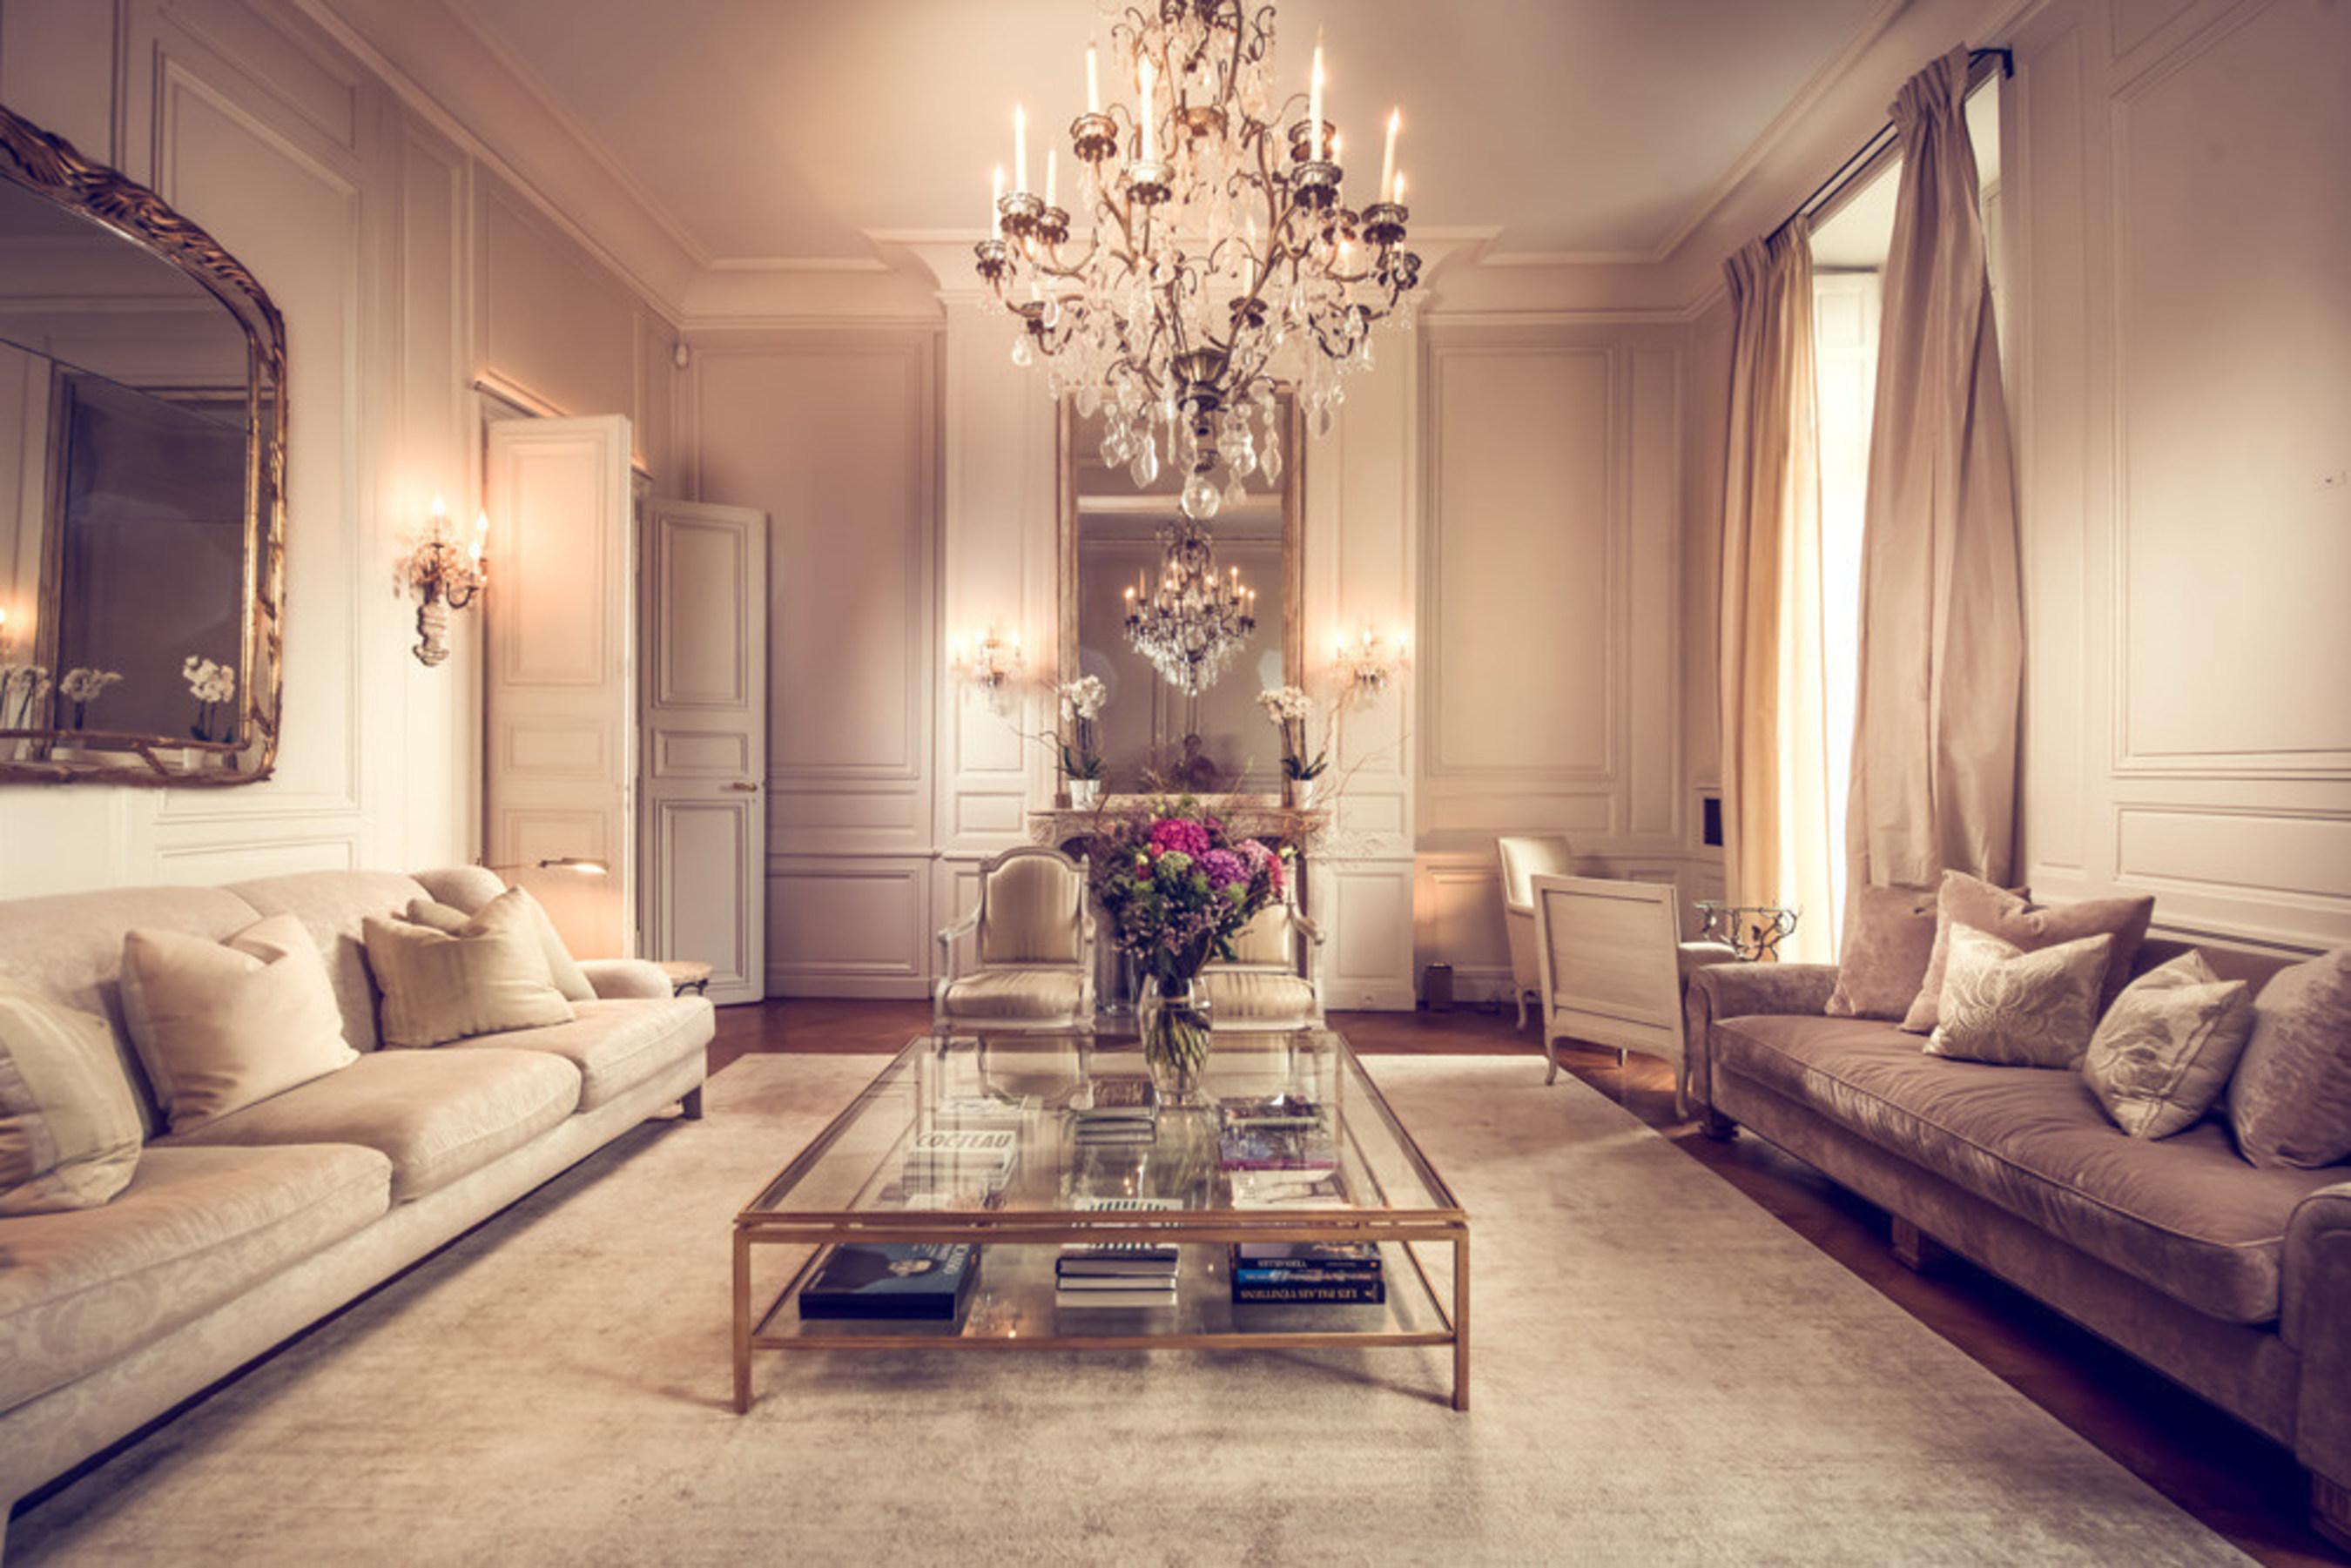 Paris Luxury Rentals And Paris Most Coveted Apartments